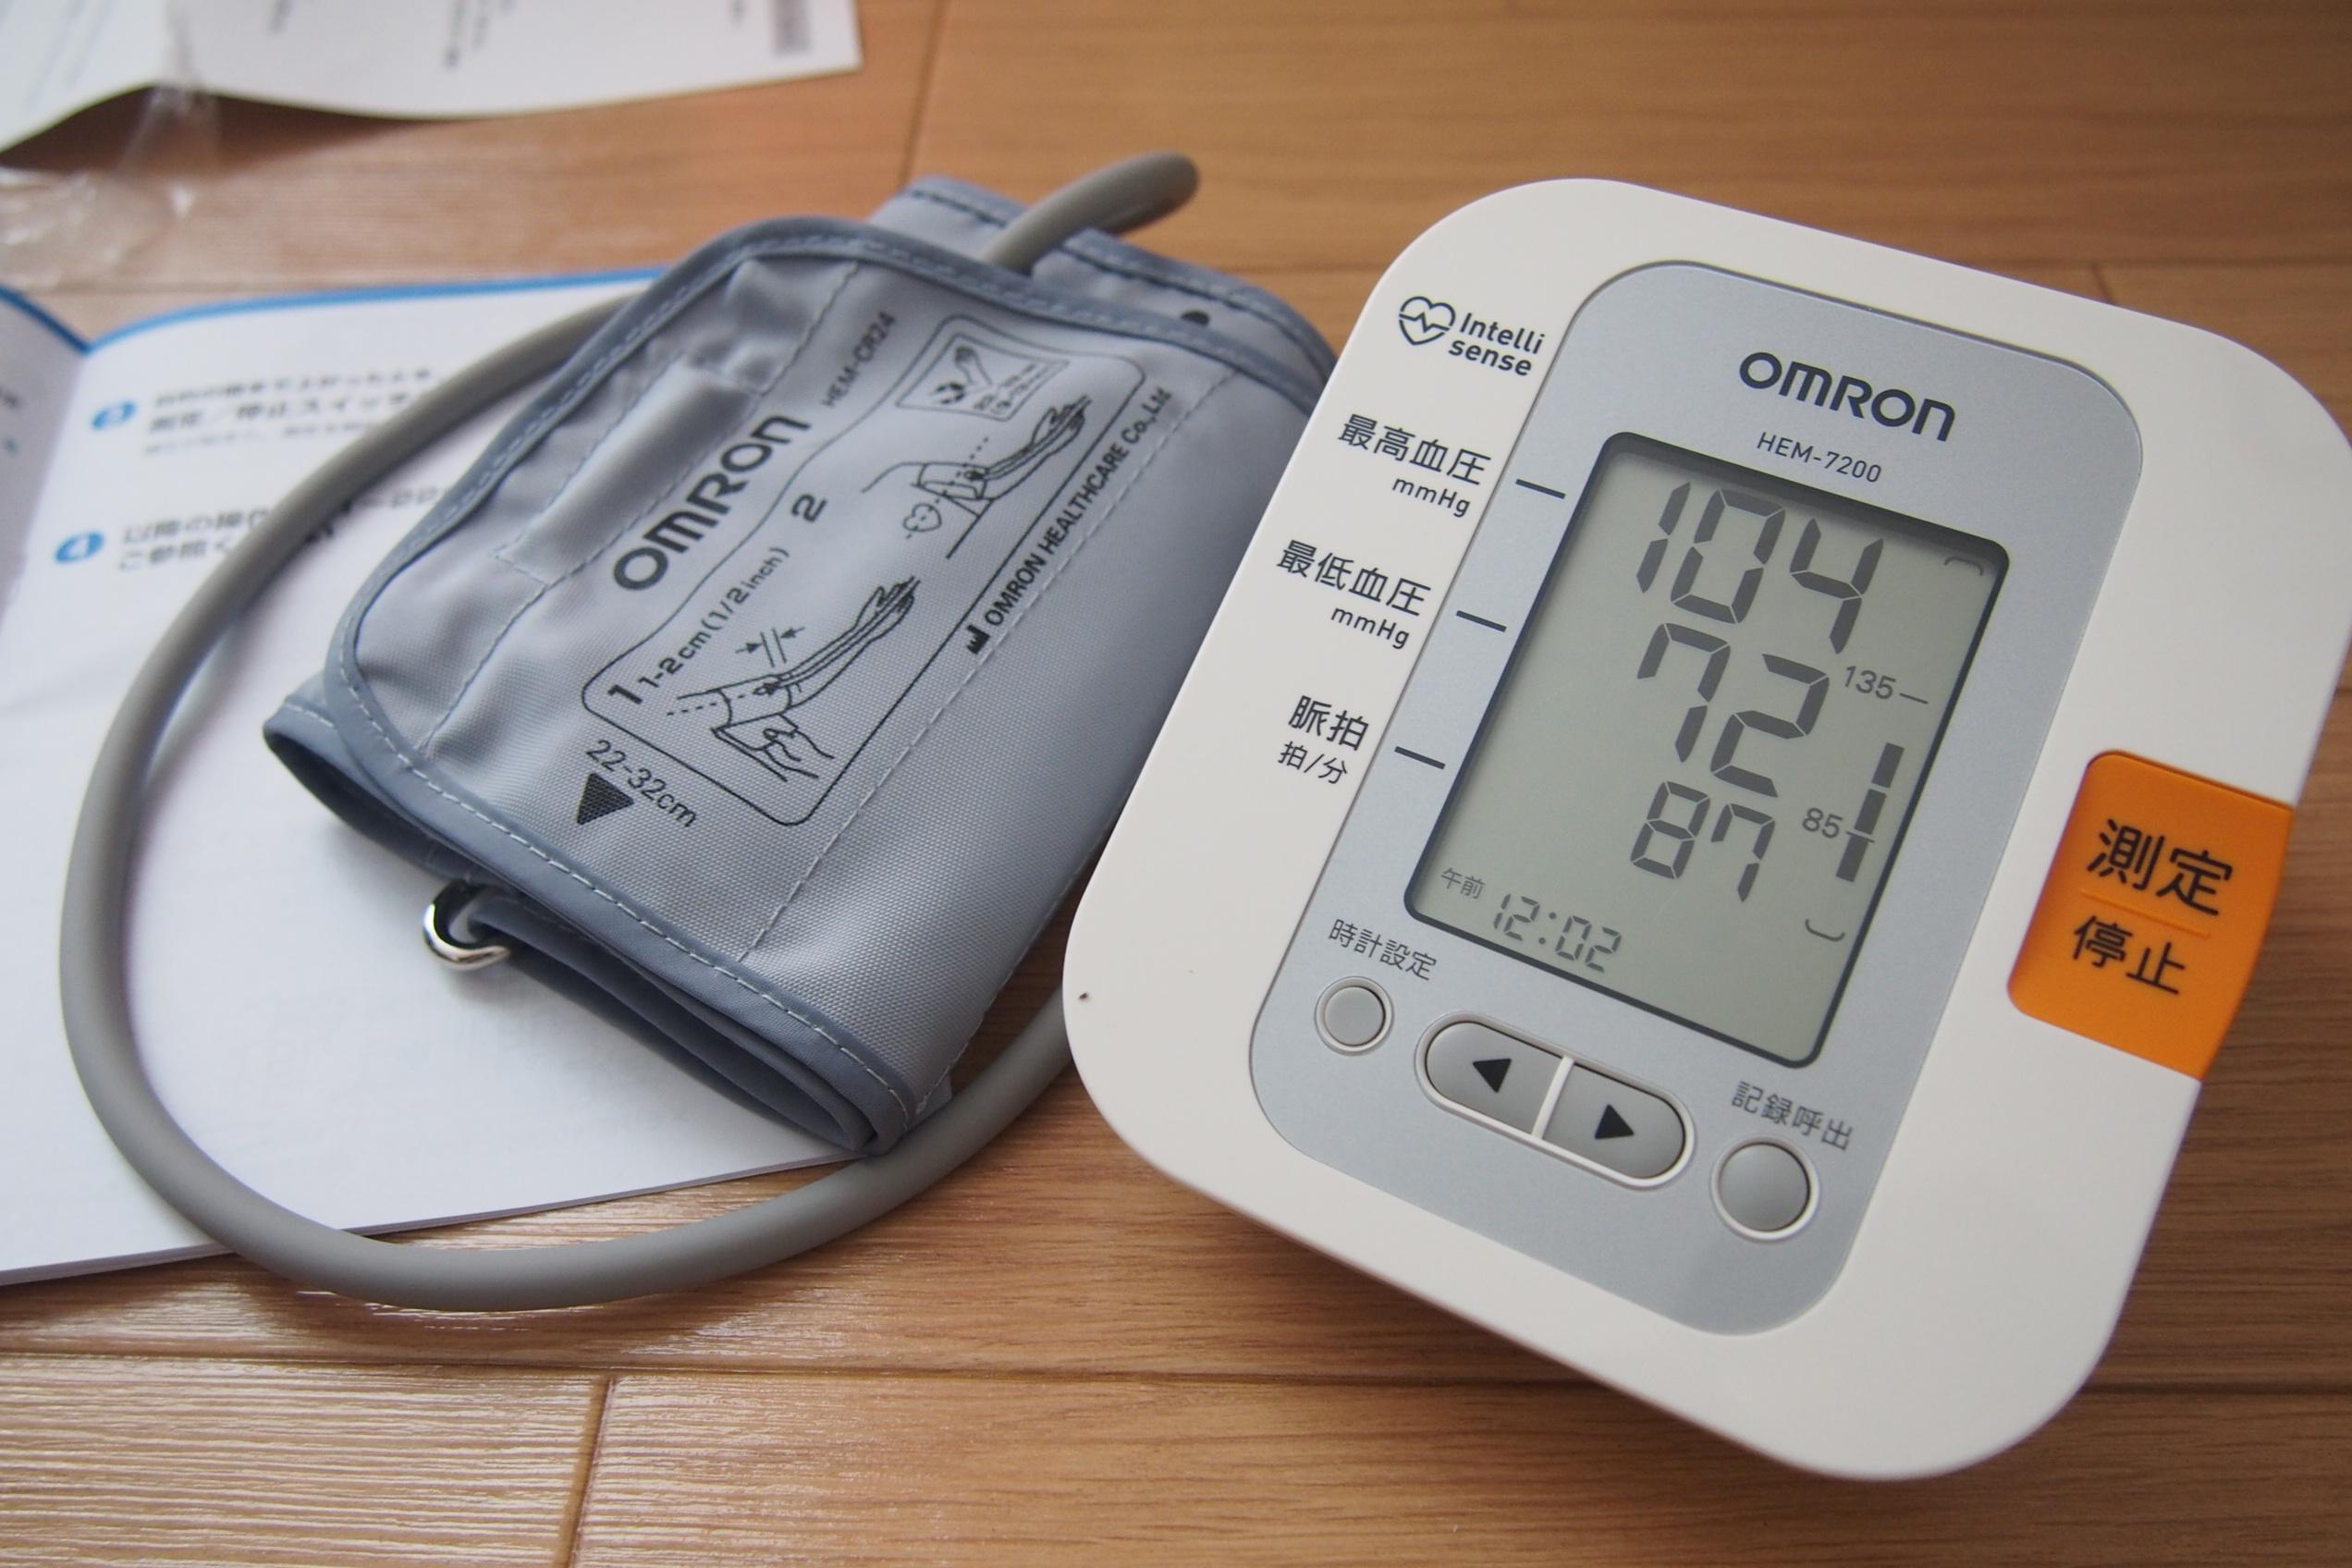 P2124703 血圧がはかりたくて上腕式血圧計「オムロンHEM-7200」を購入